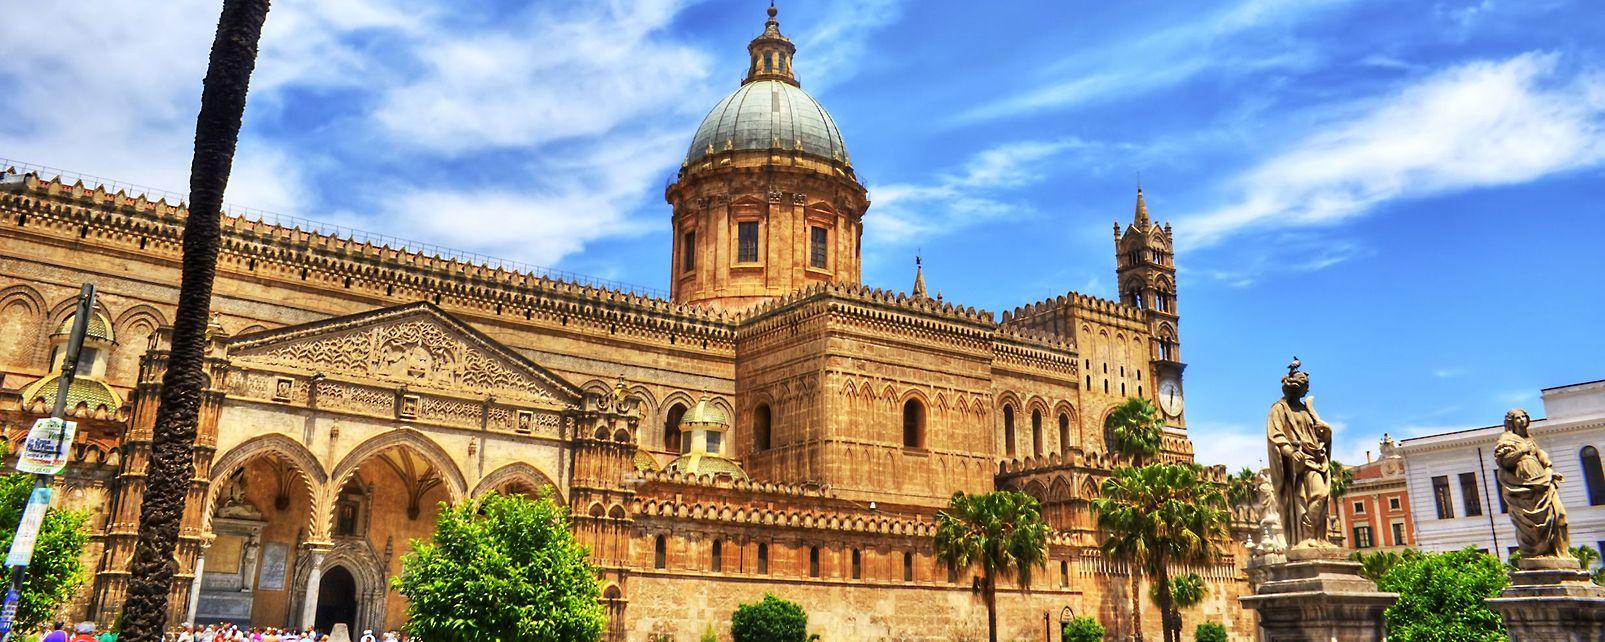 Palermo, Sizilien, Italien,